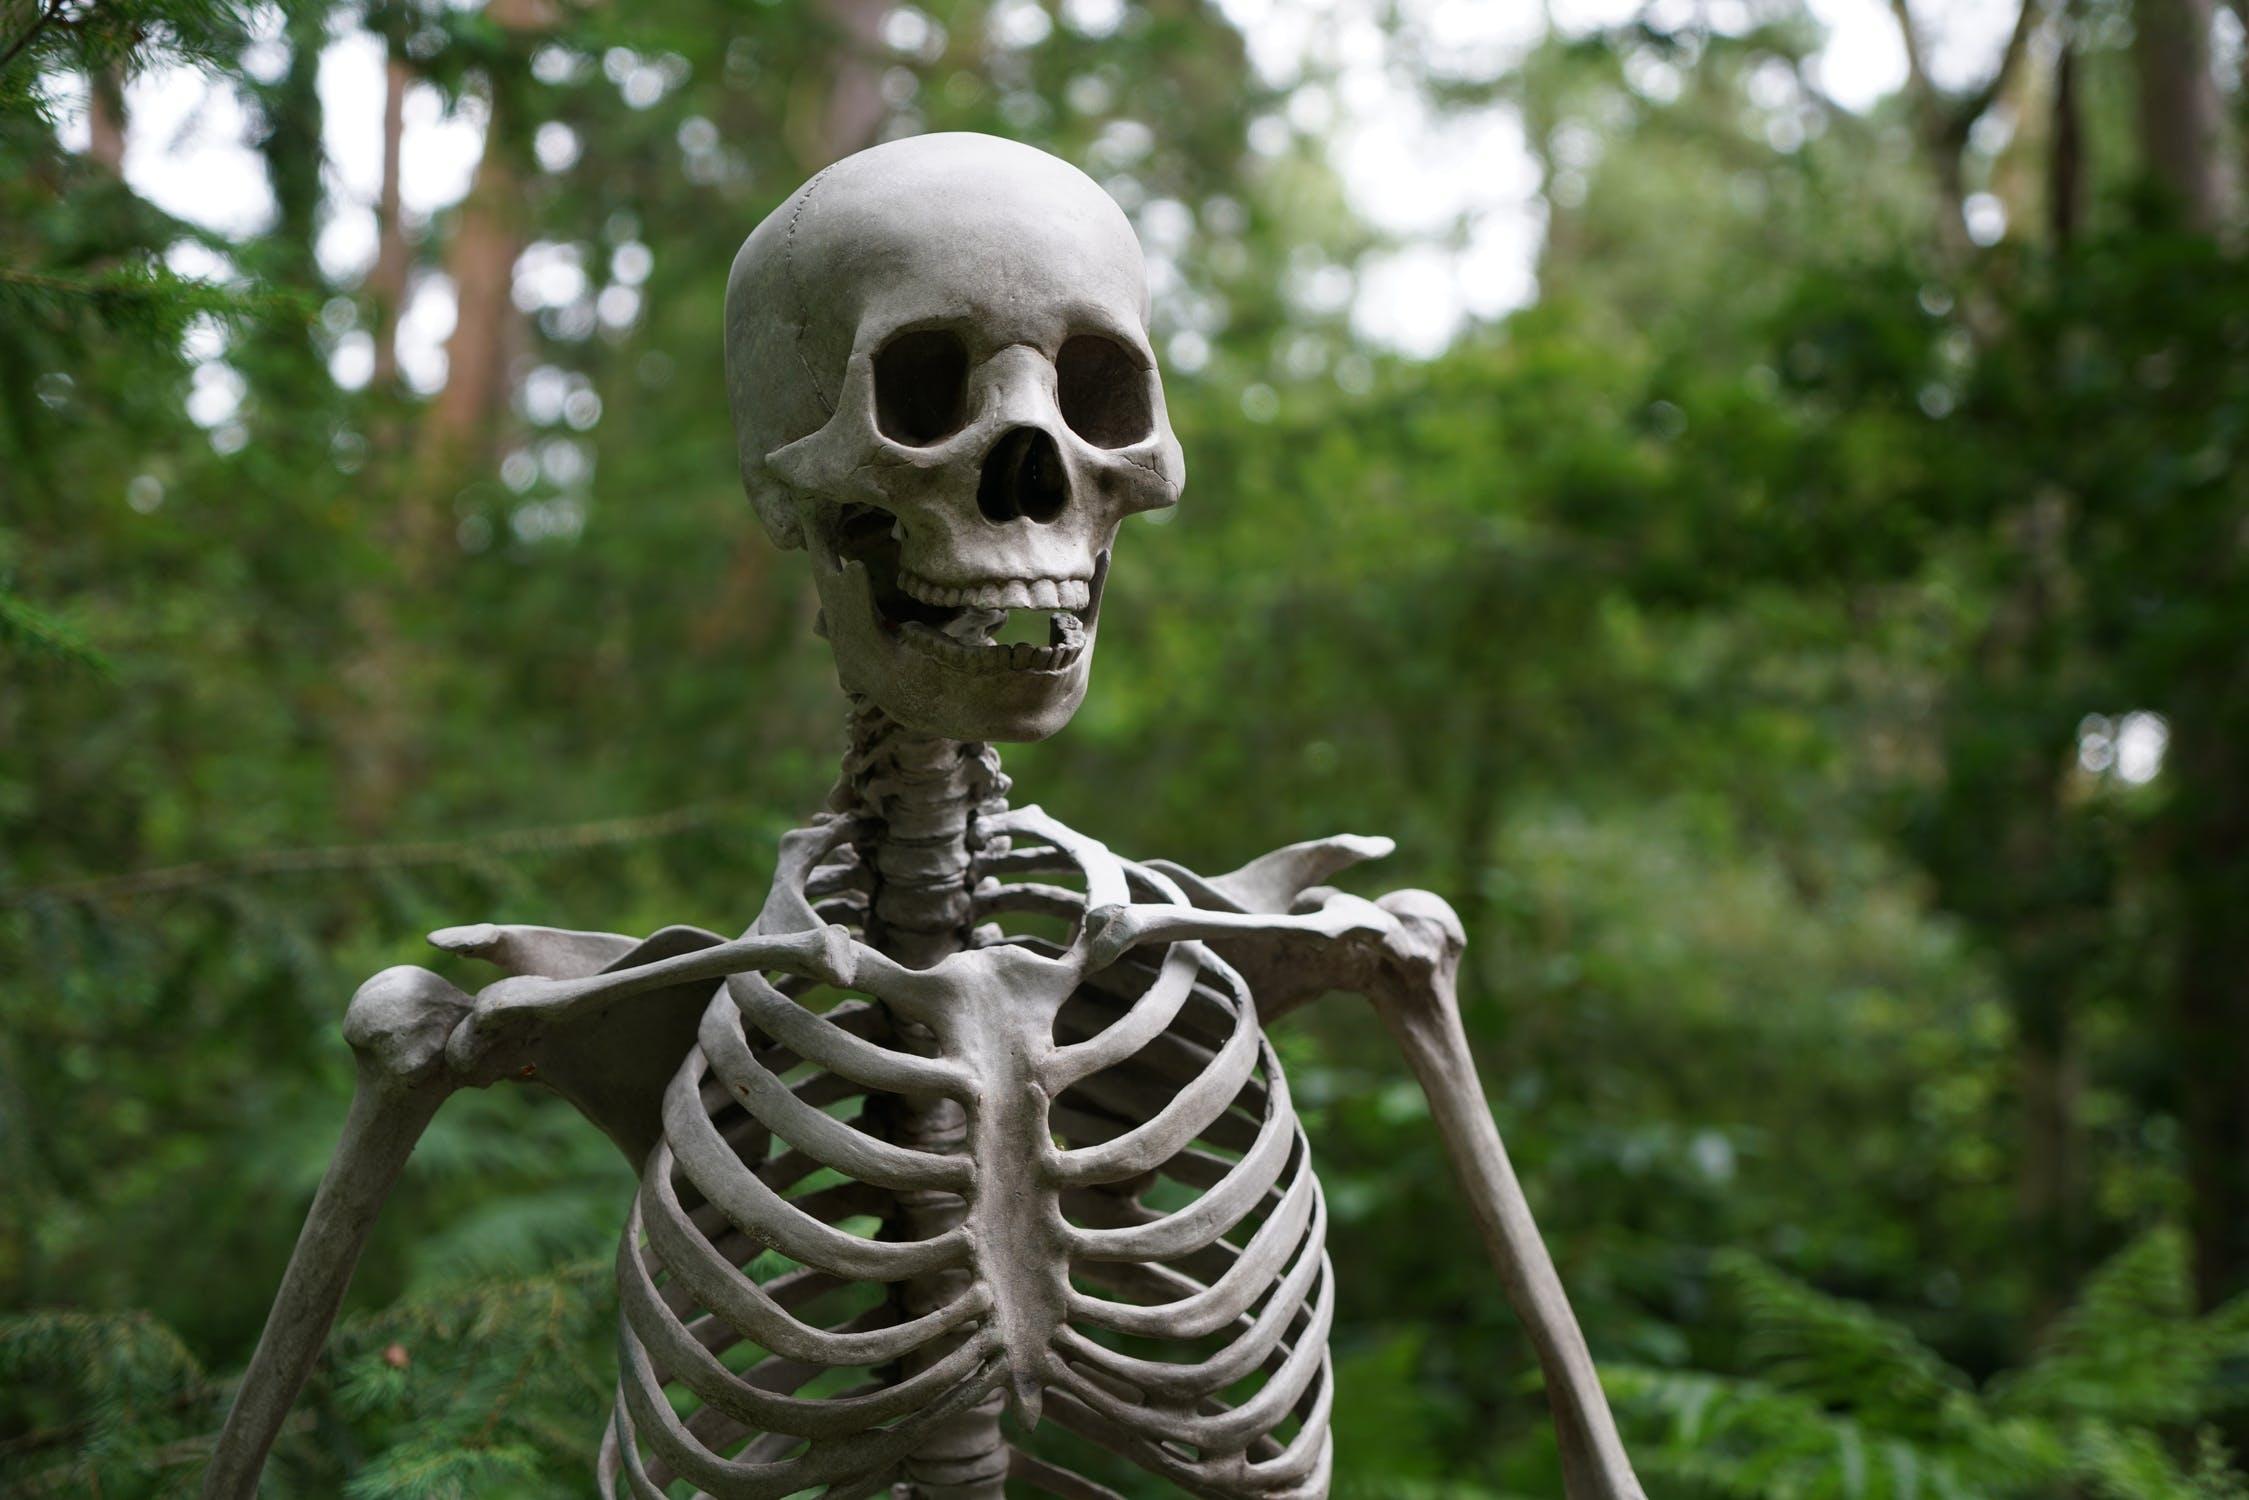 skeleton, yescomusa, halloween decor